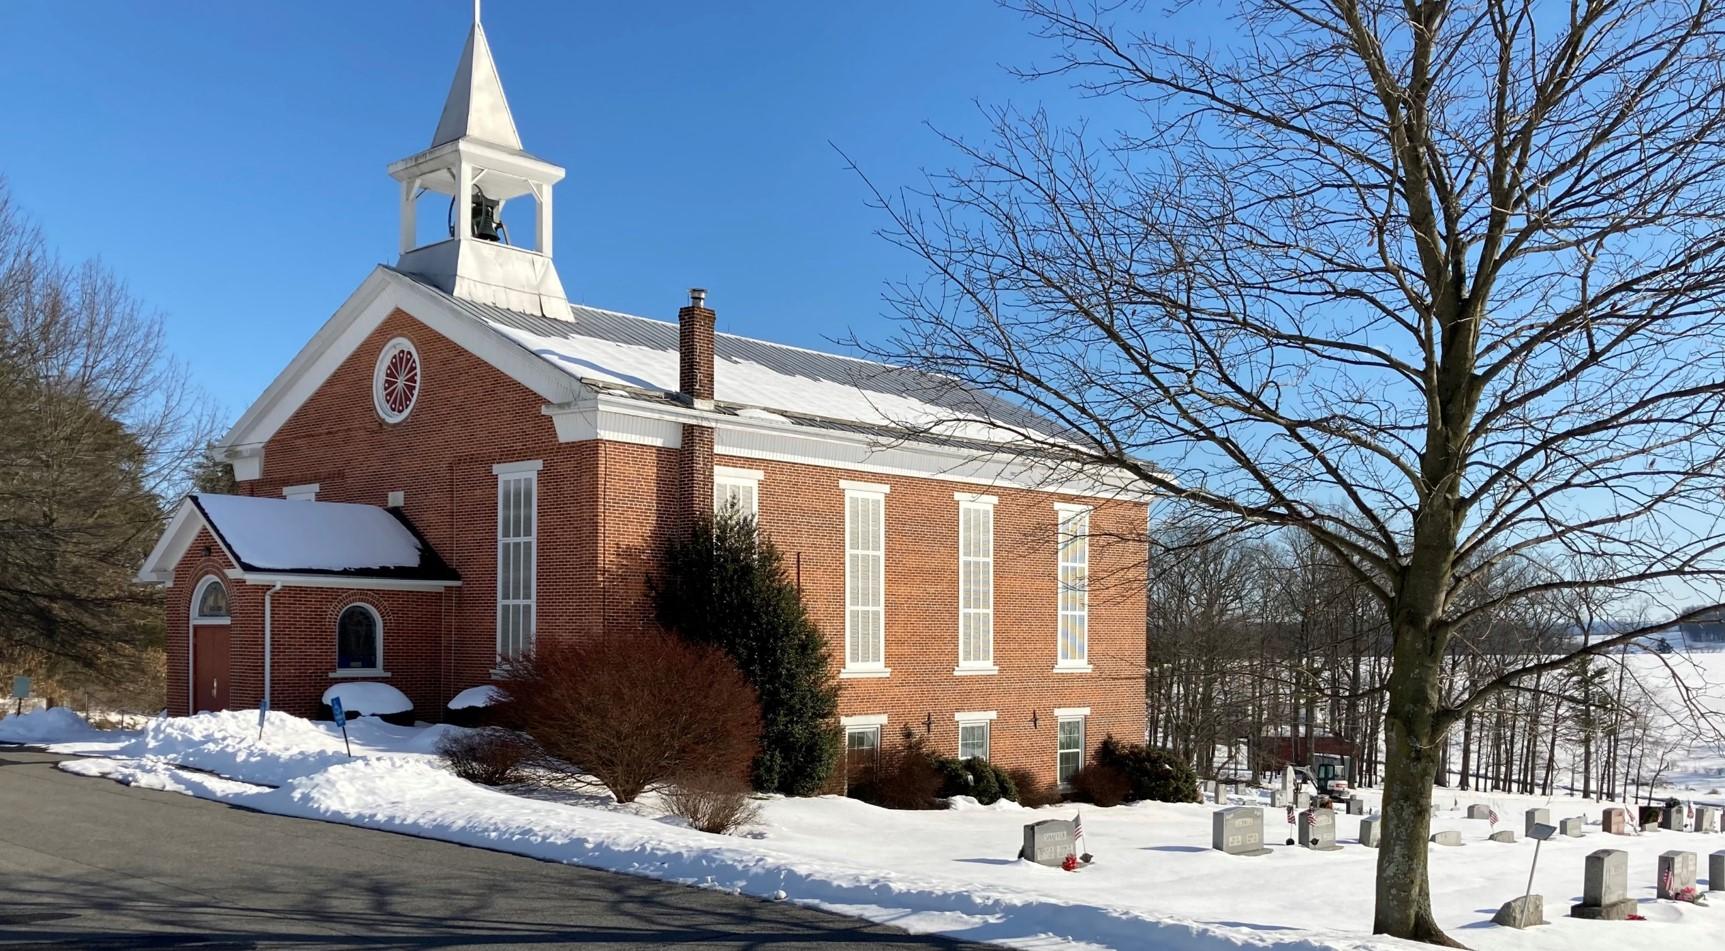 Grubb's Church, Chapman Township